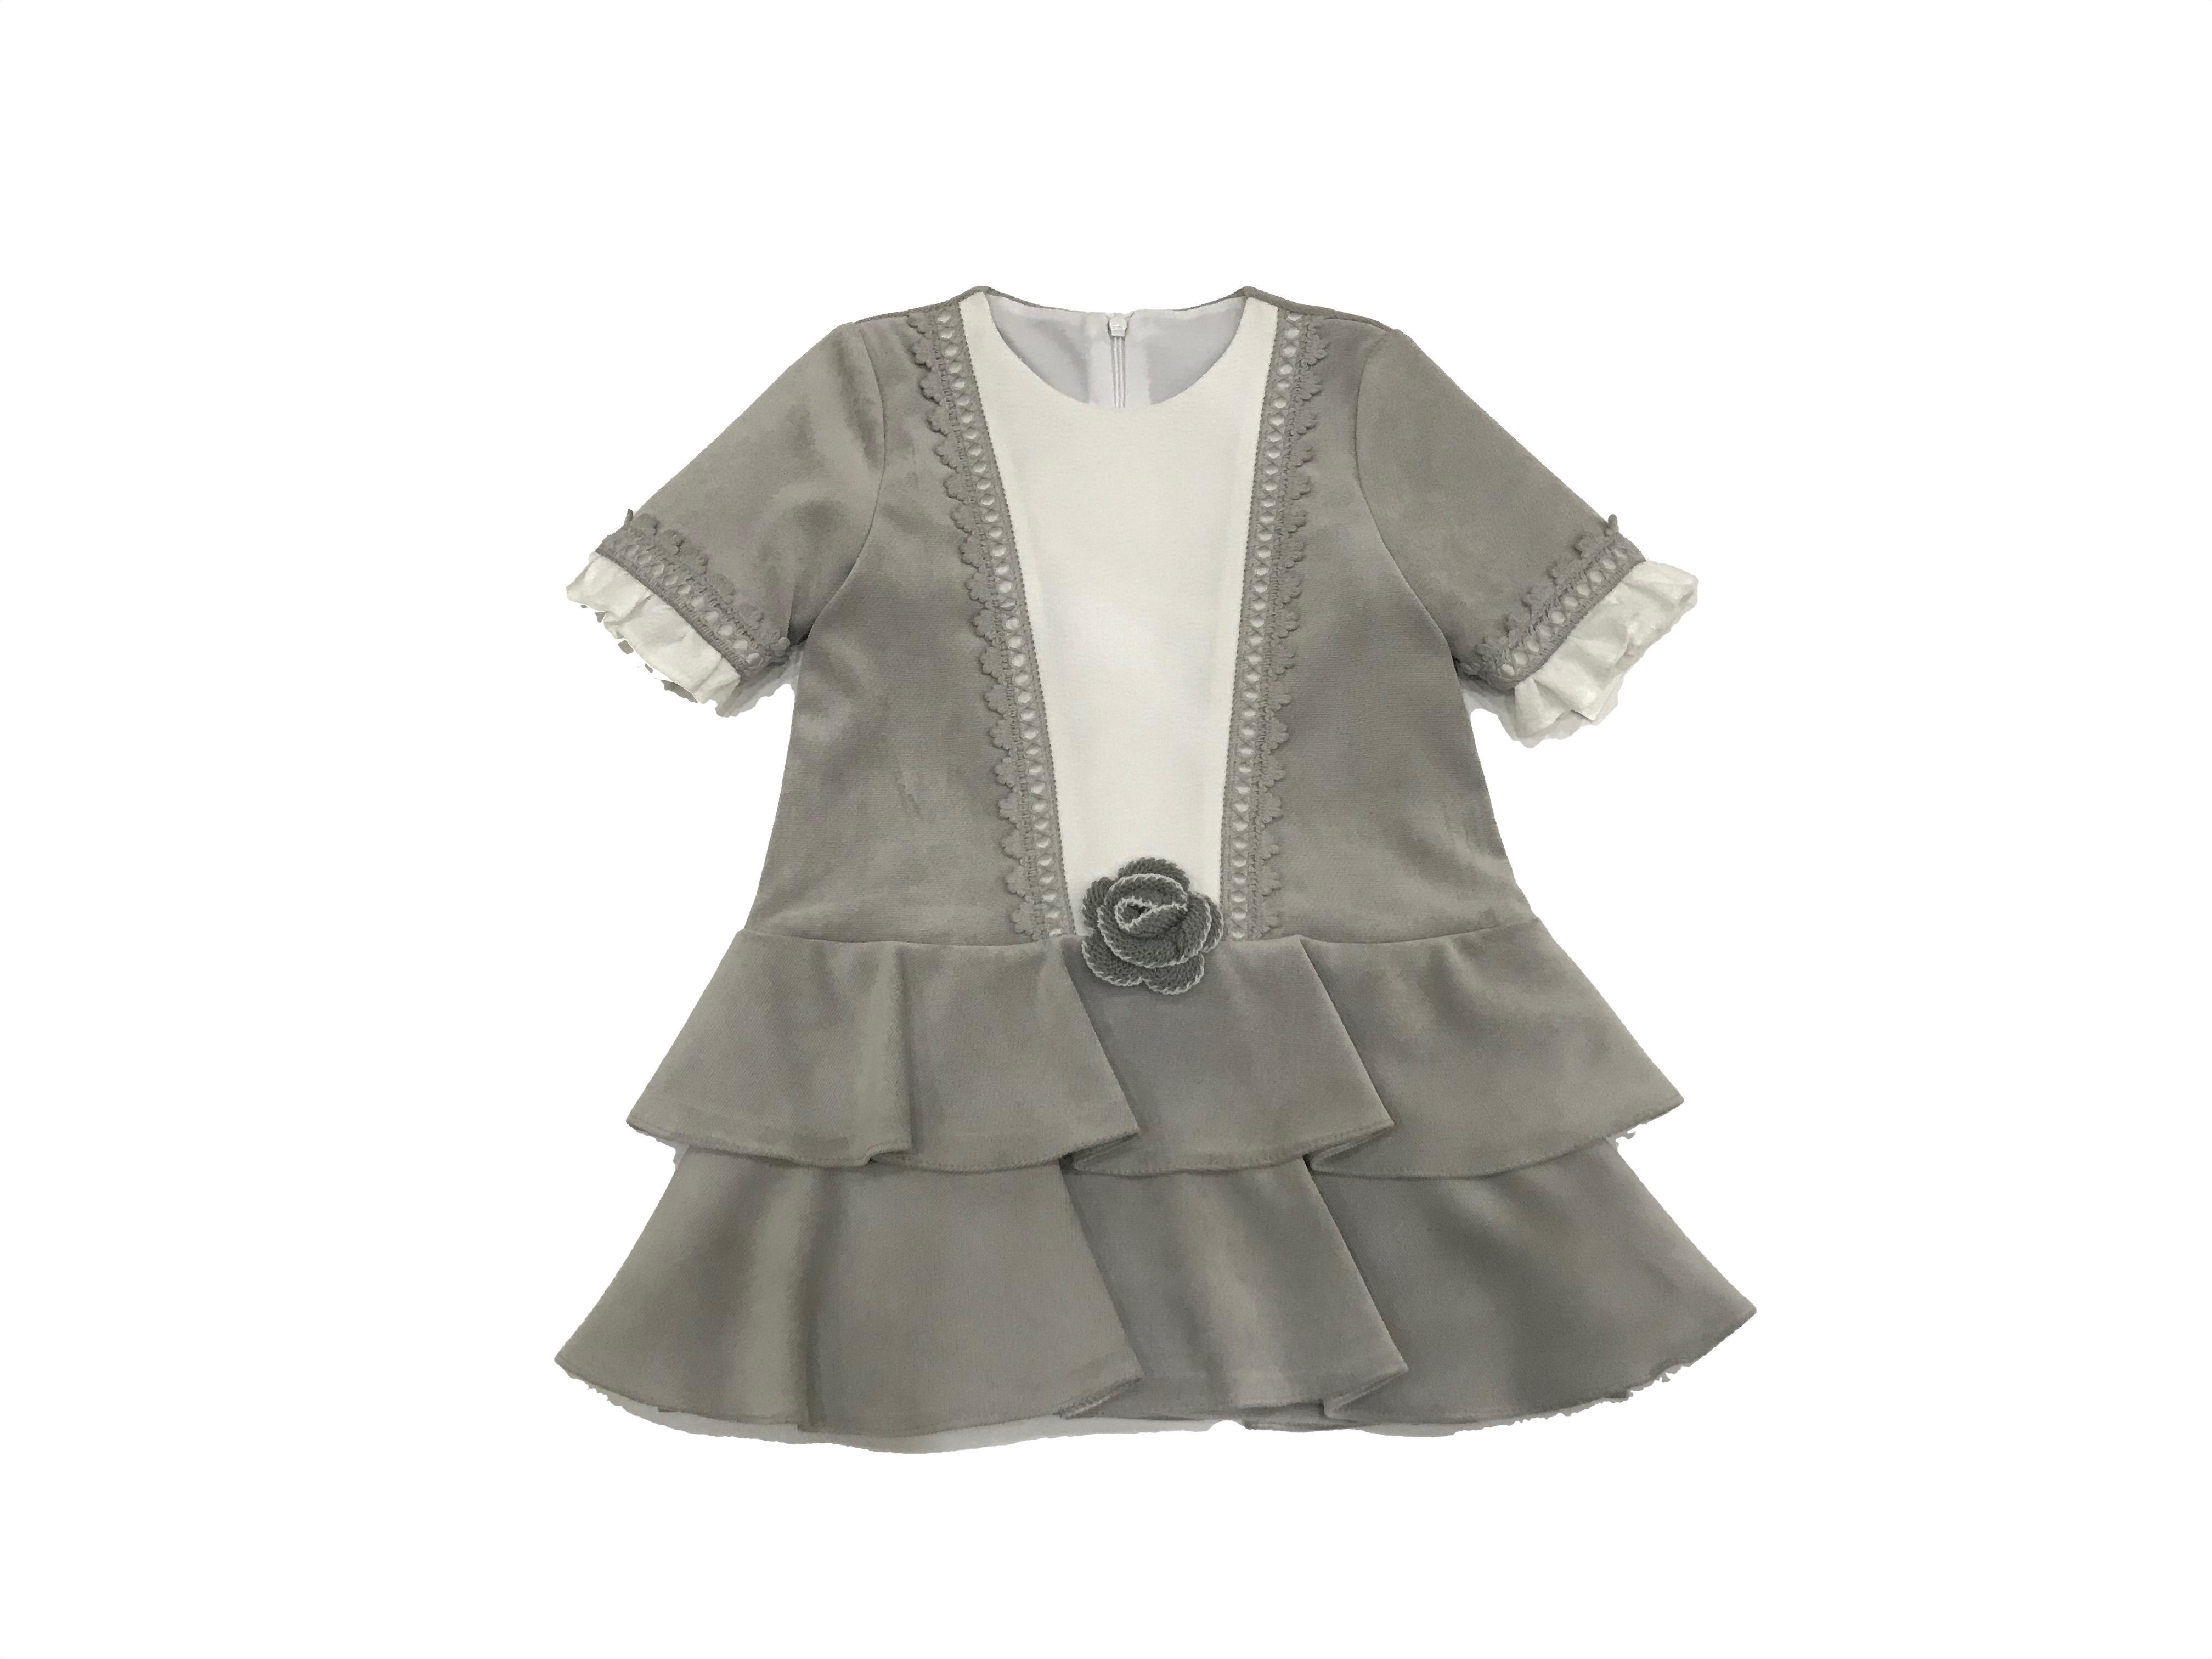 Outlet Marta y Paula vestido gris. Dados moda infantil b45f6893ad8